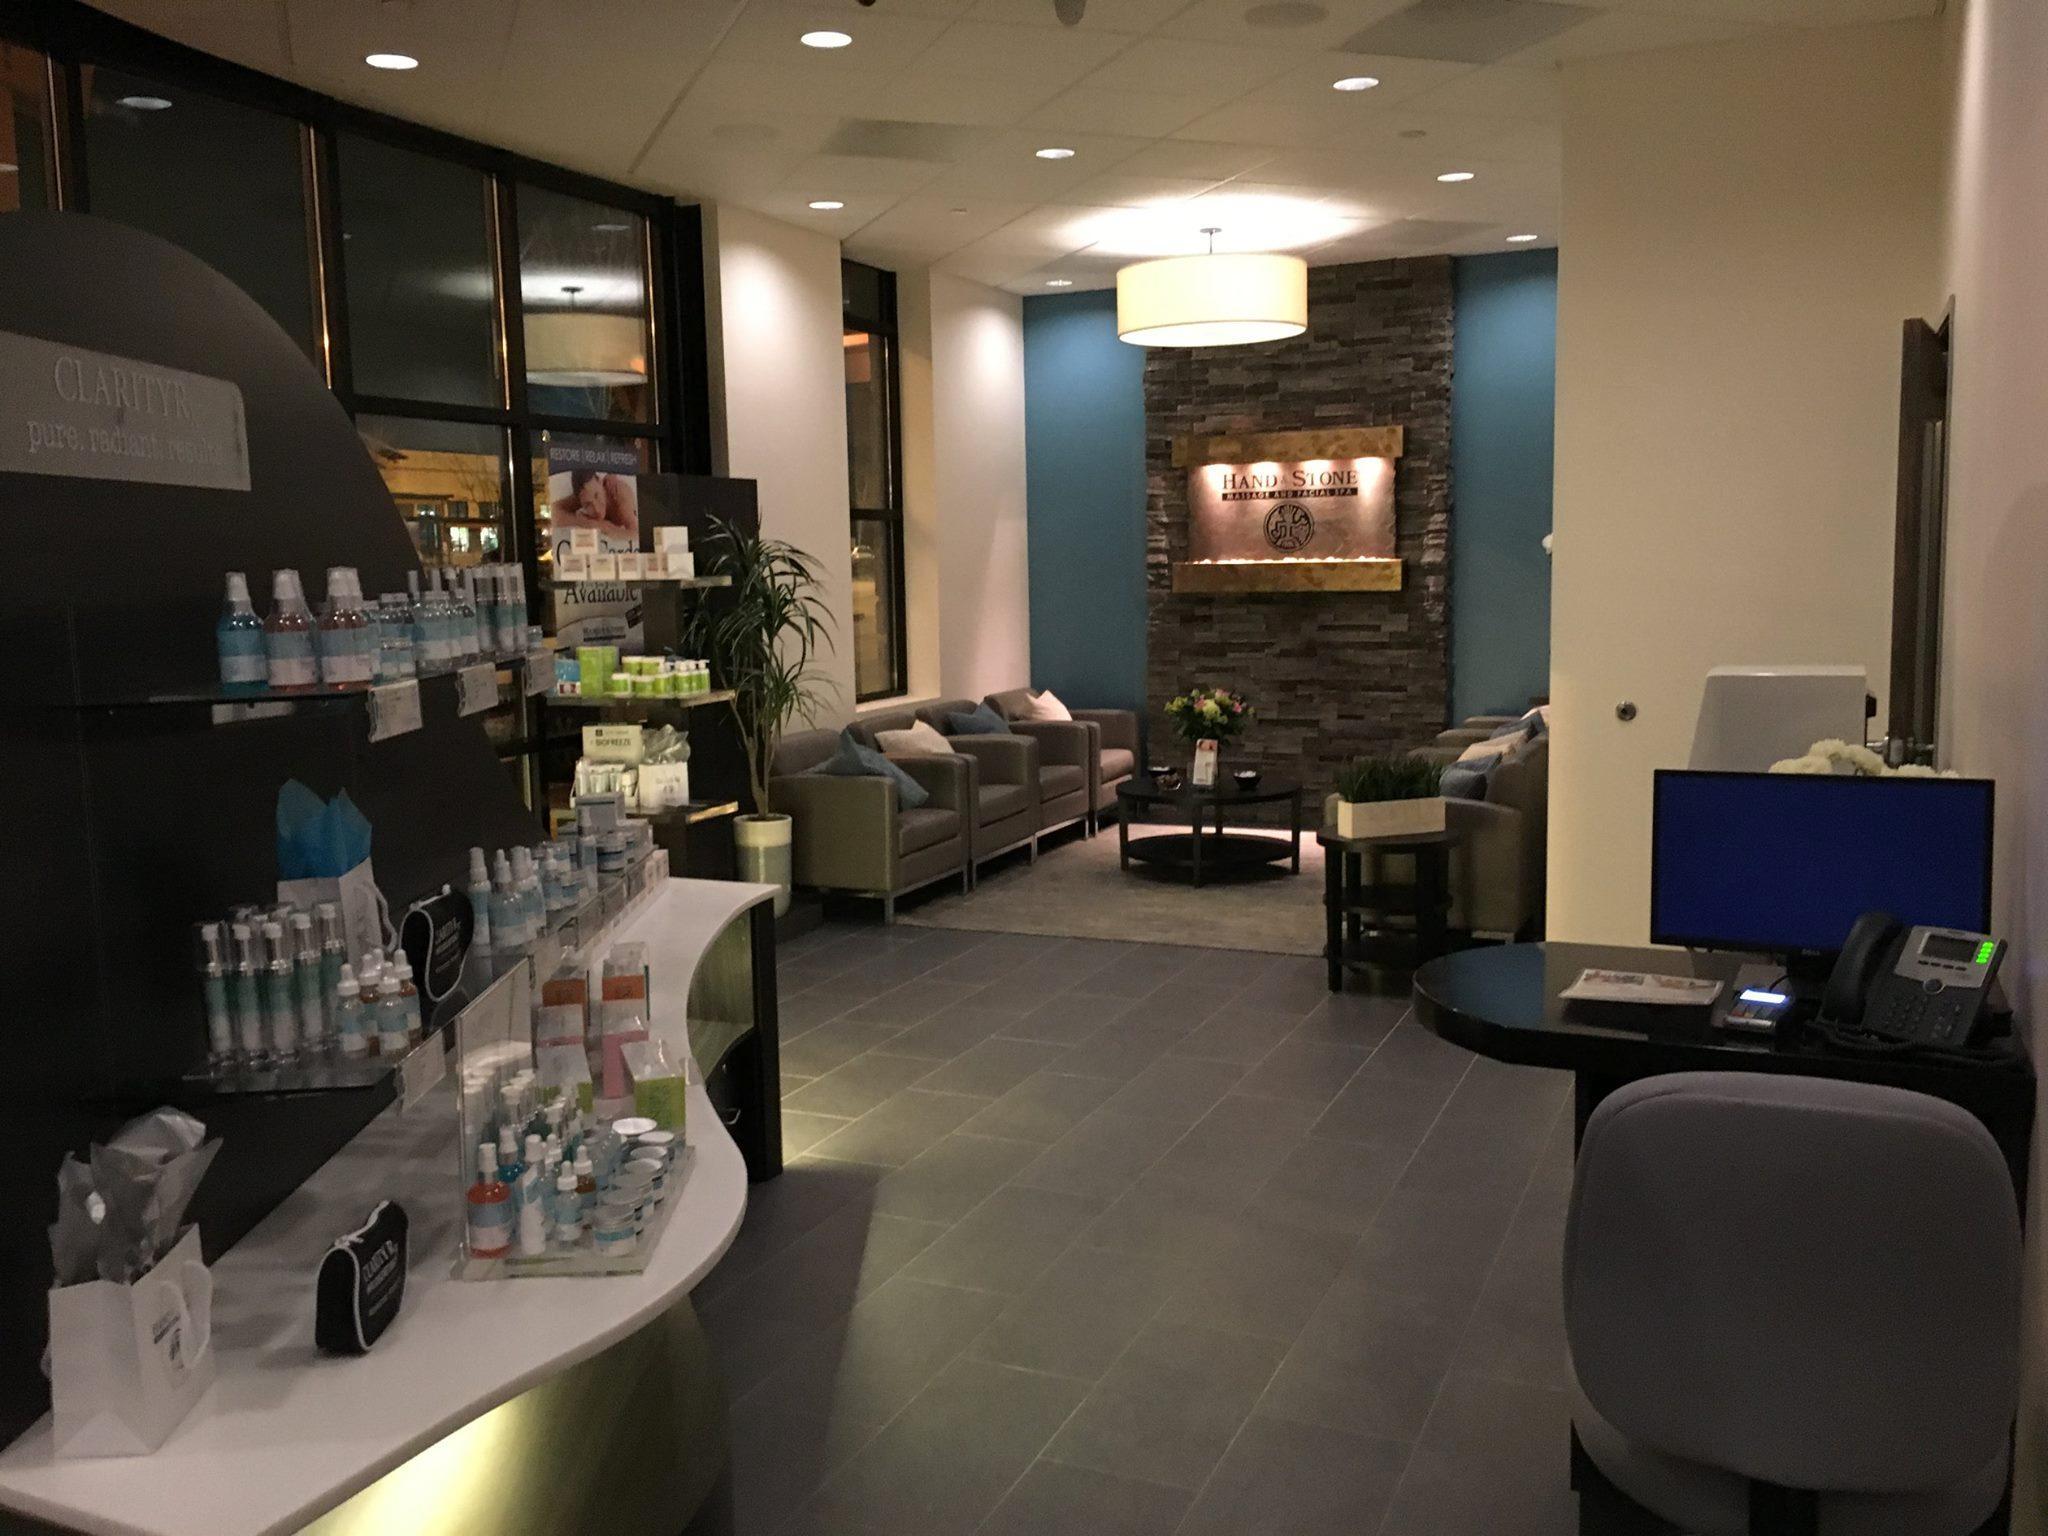 Spa in WA Vancouver 98683 Hand & Stone Massage and Facial Spa 3415 SE 192nd Avenue #108 (360)226-2593